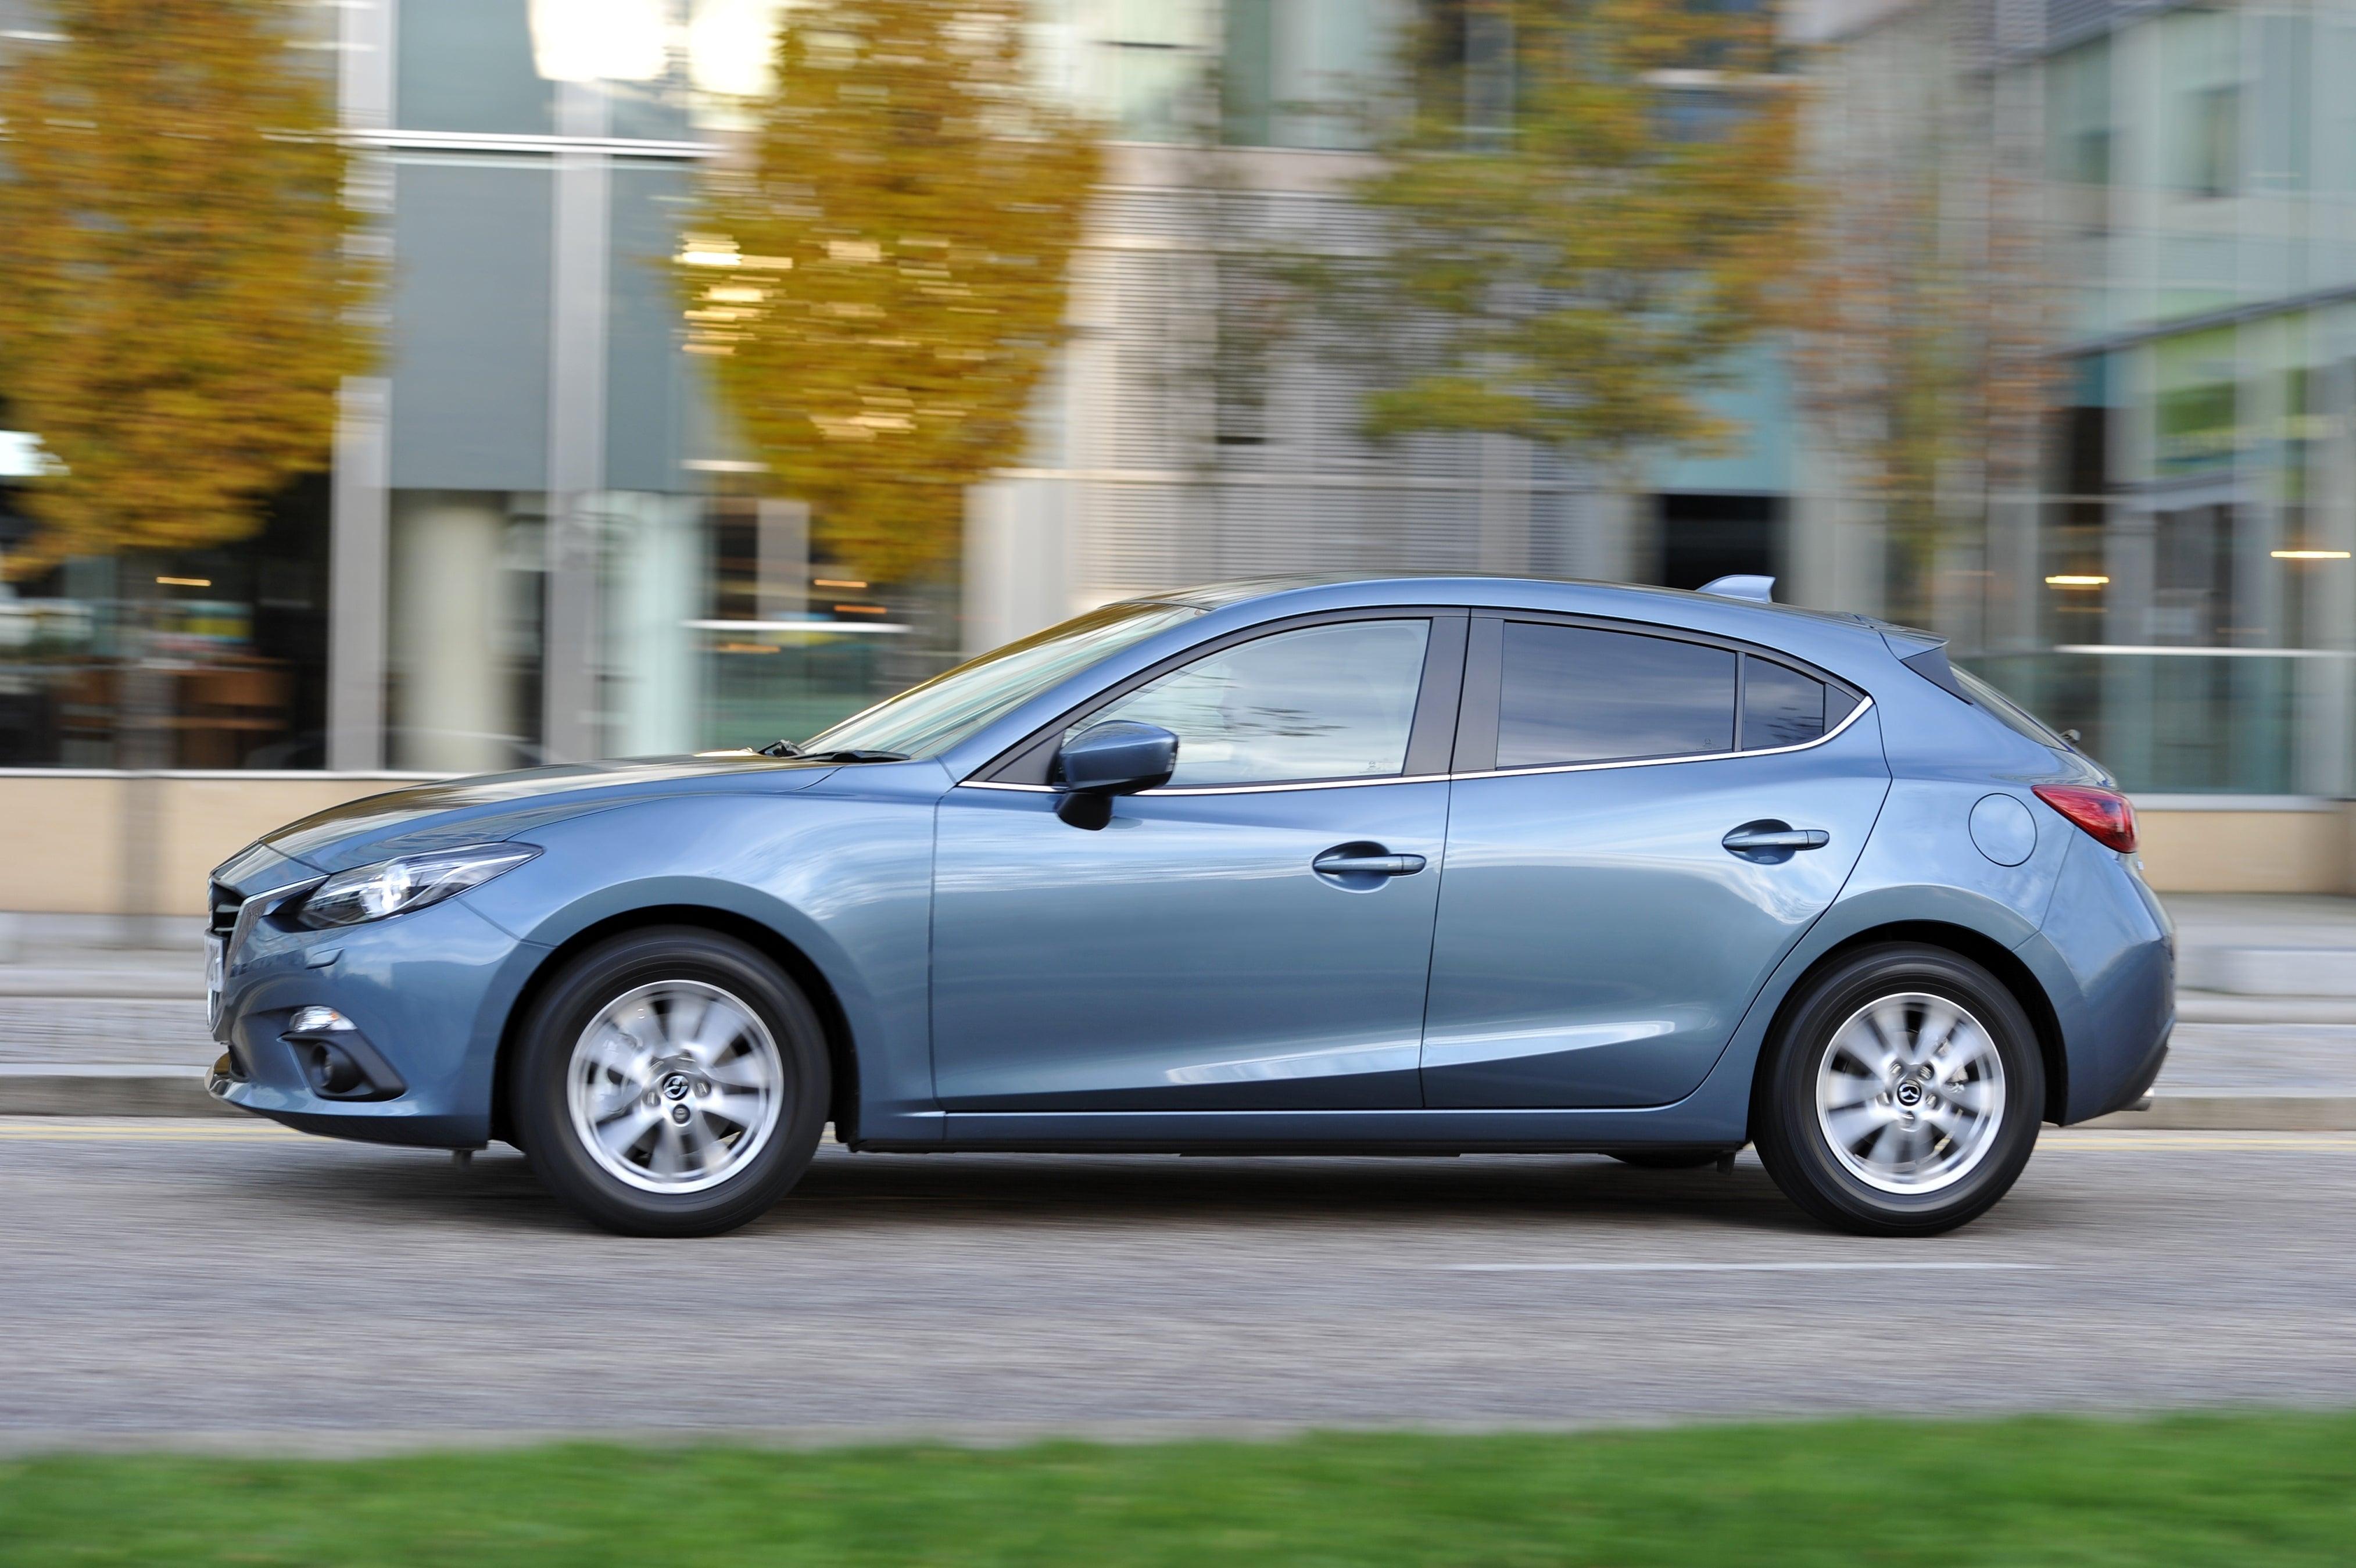 Mazda 3 side profile